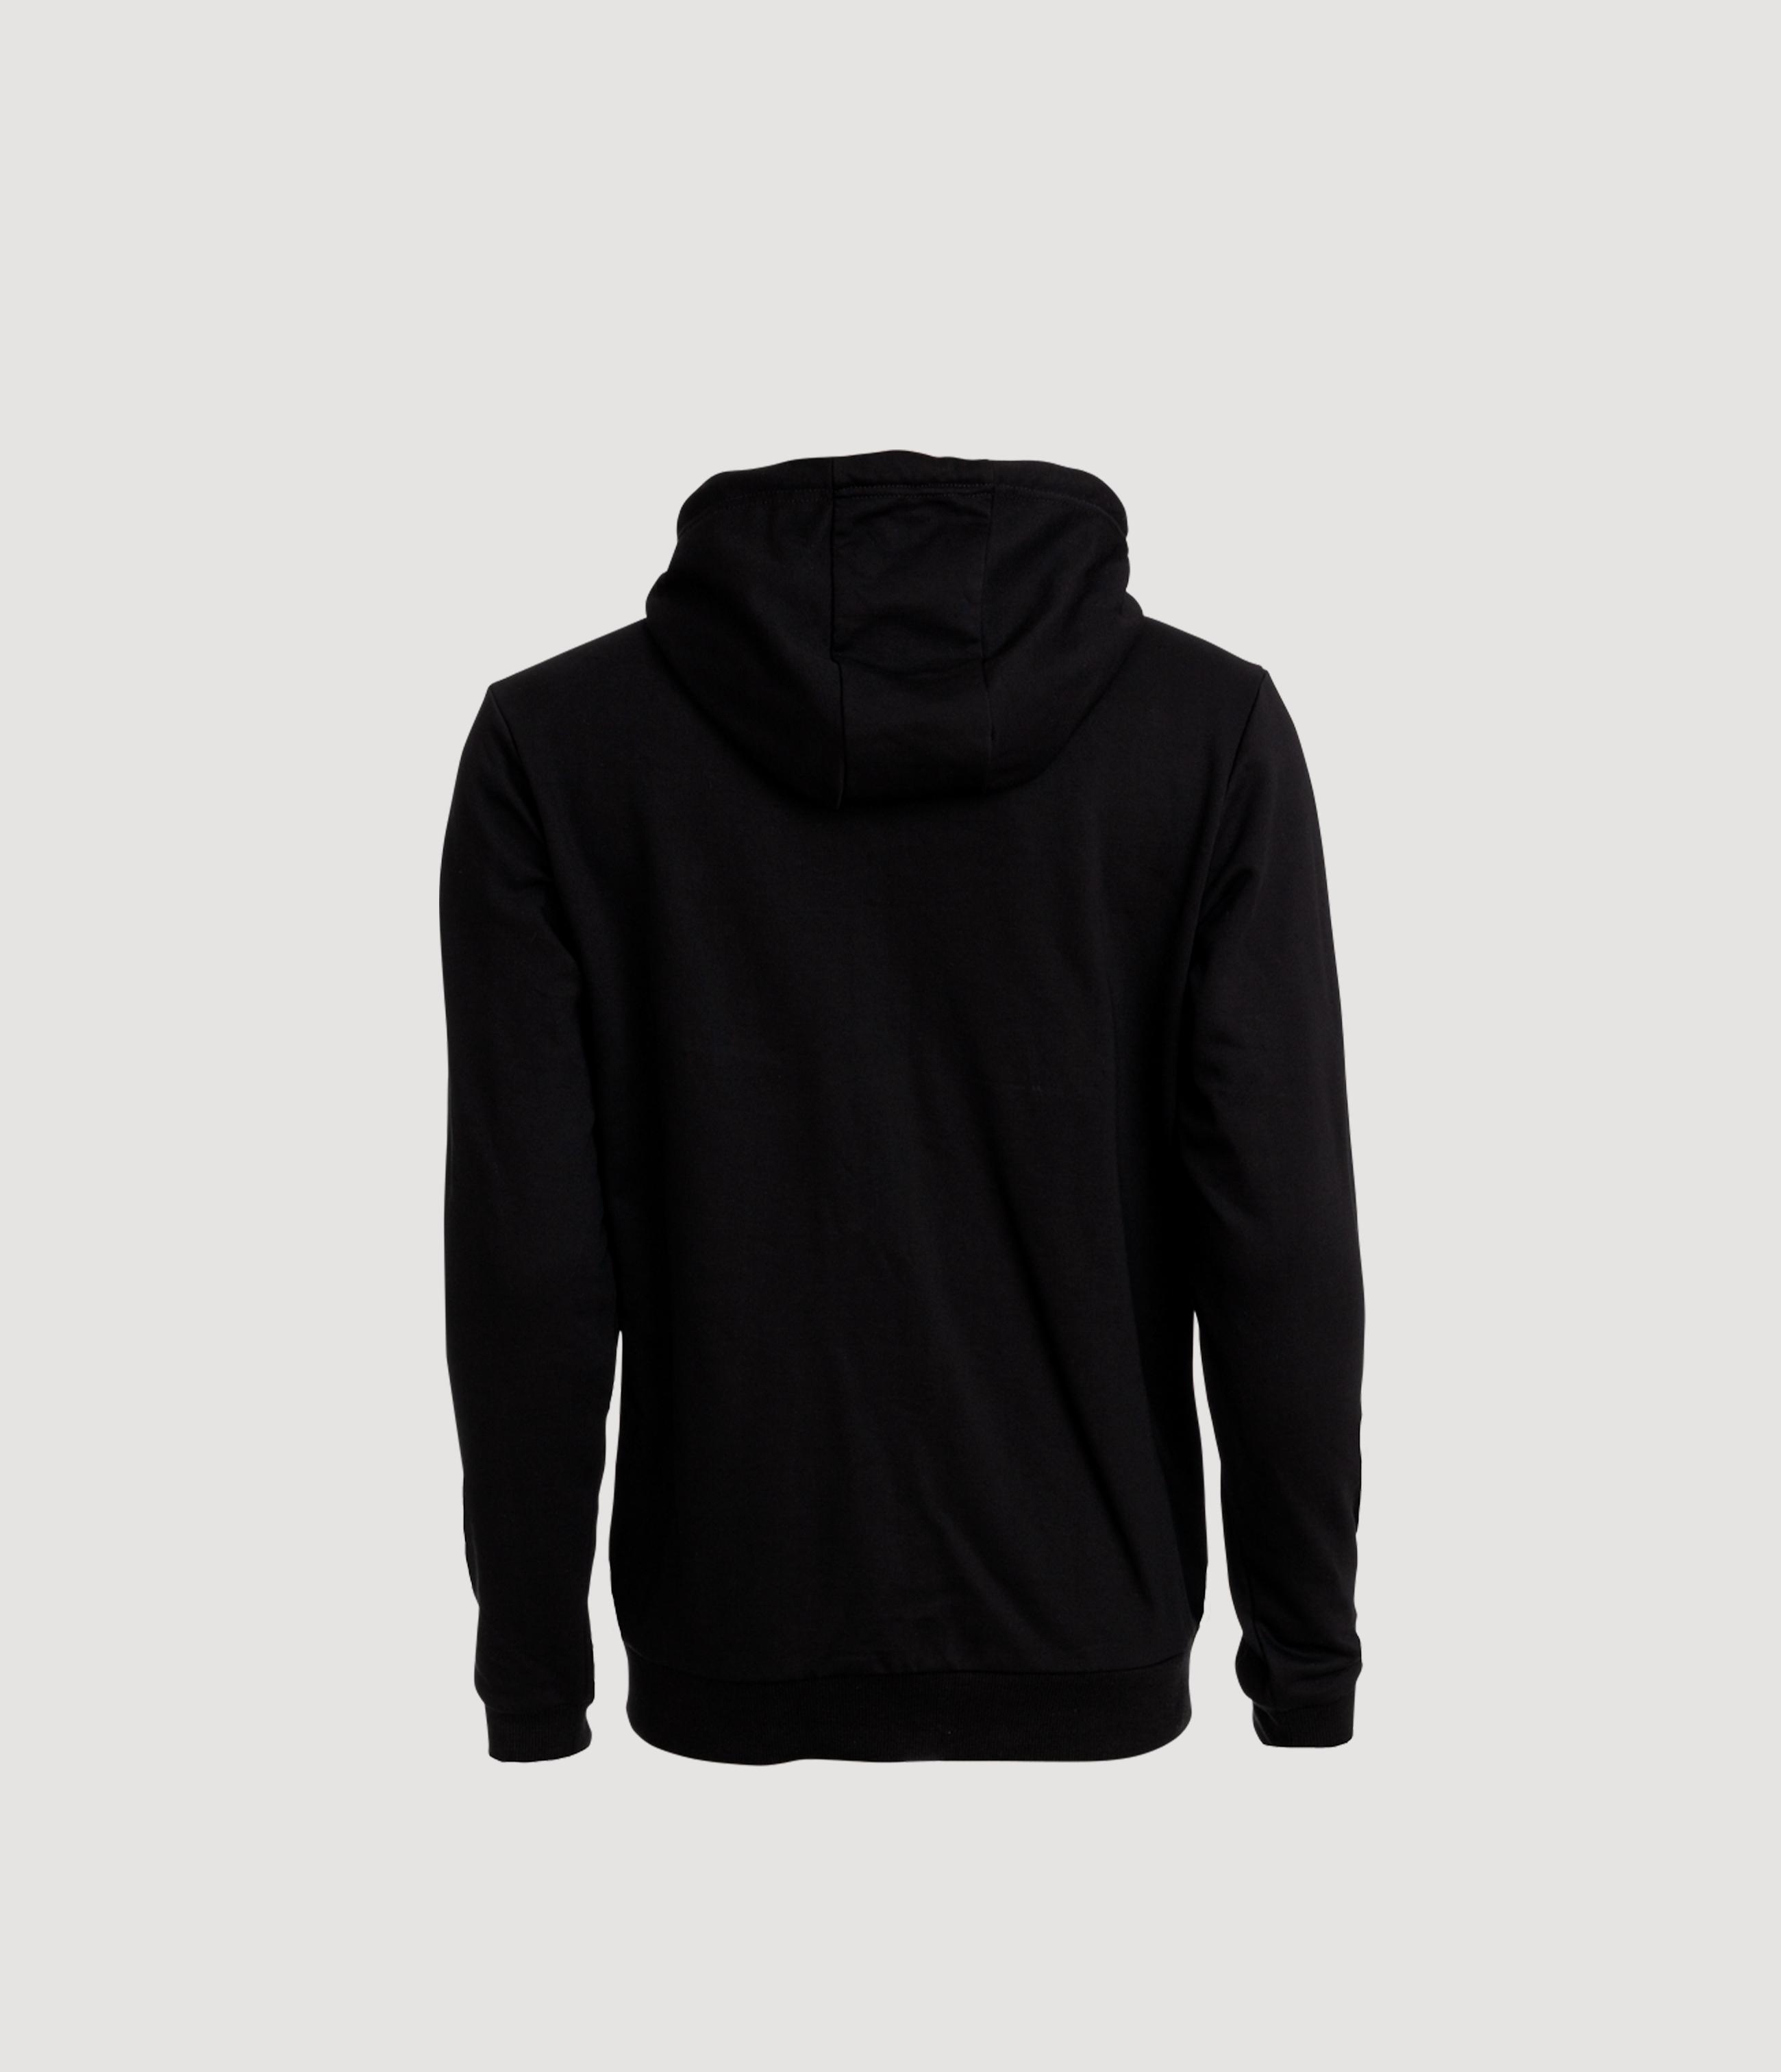 X Hood Black Back